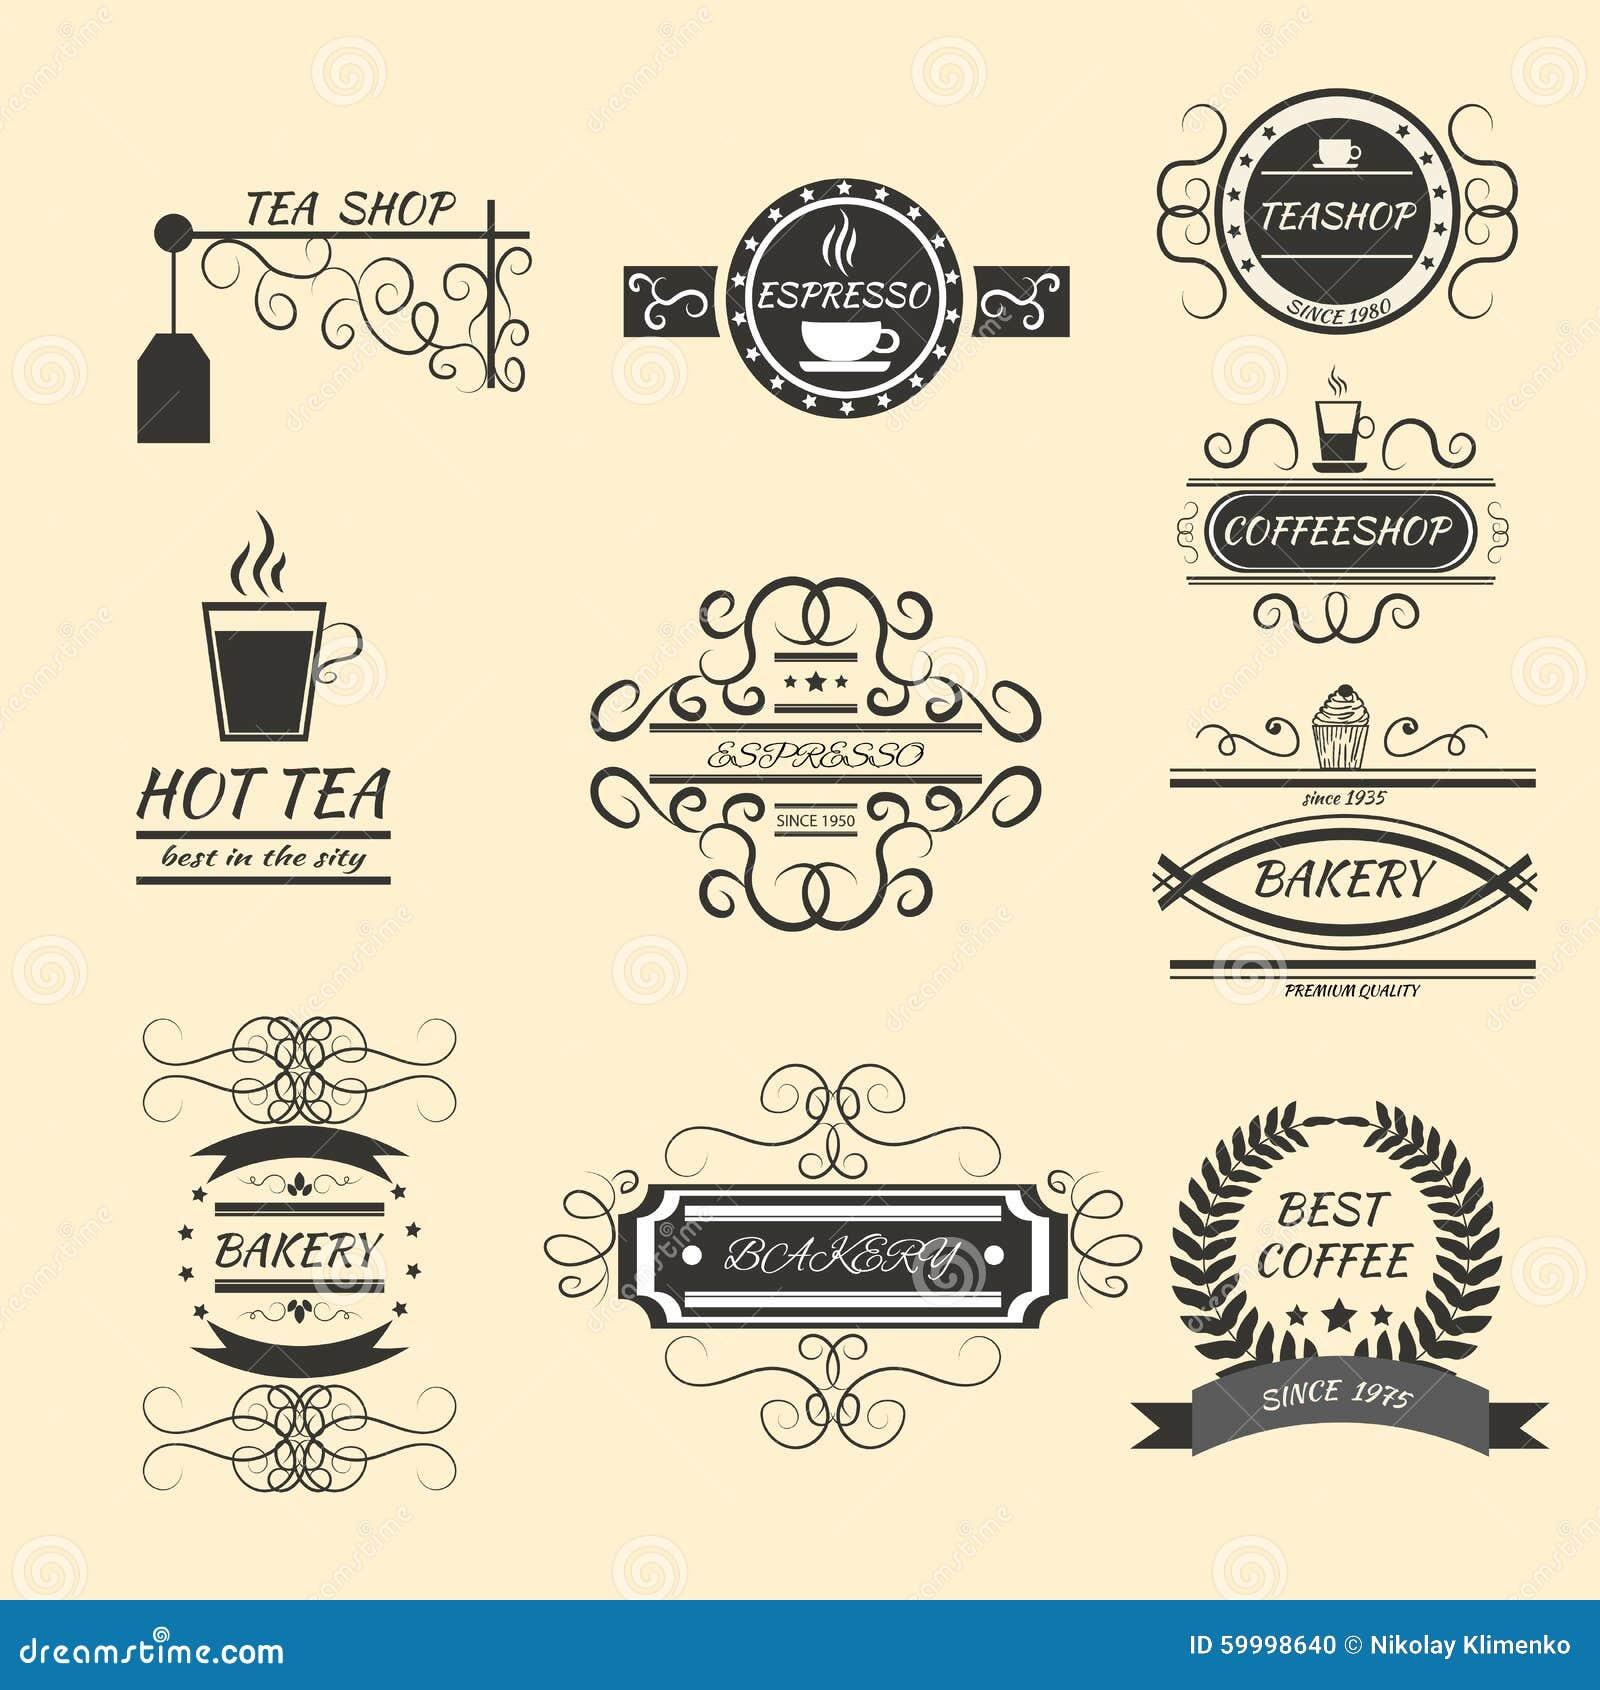 Art logo logo s coffee logo coffee shop coffee design shop logo coffee - Bakery Business Coffee Coffeeshop Design Labels Logo